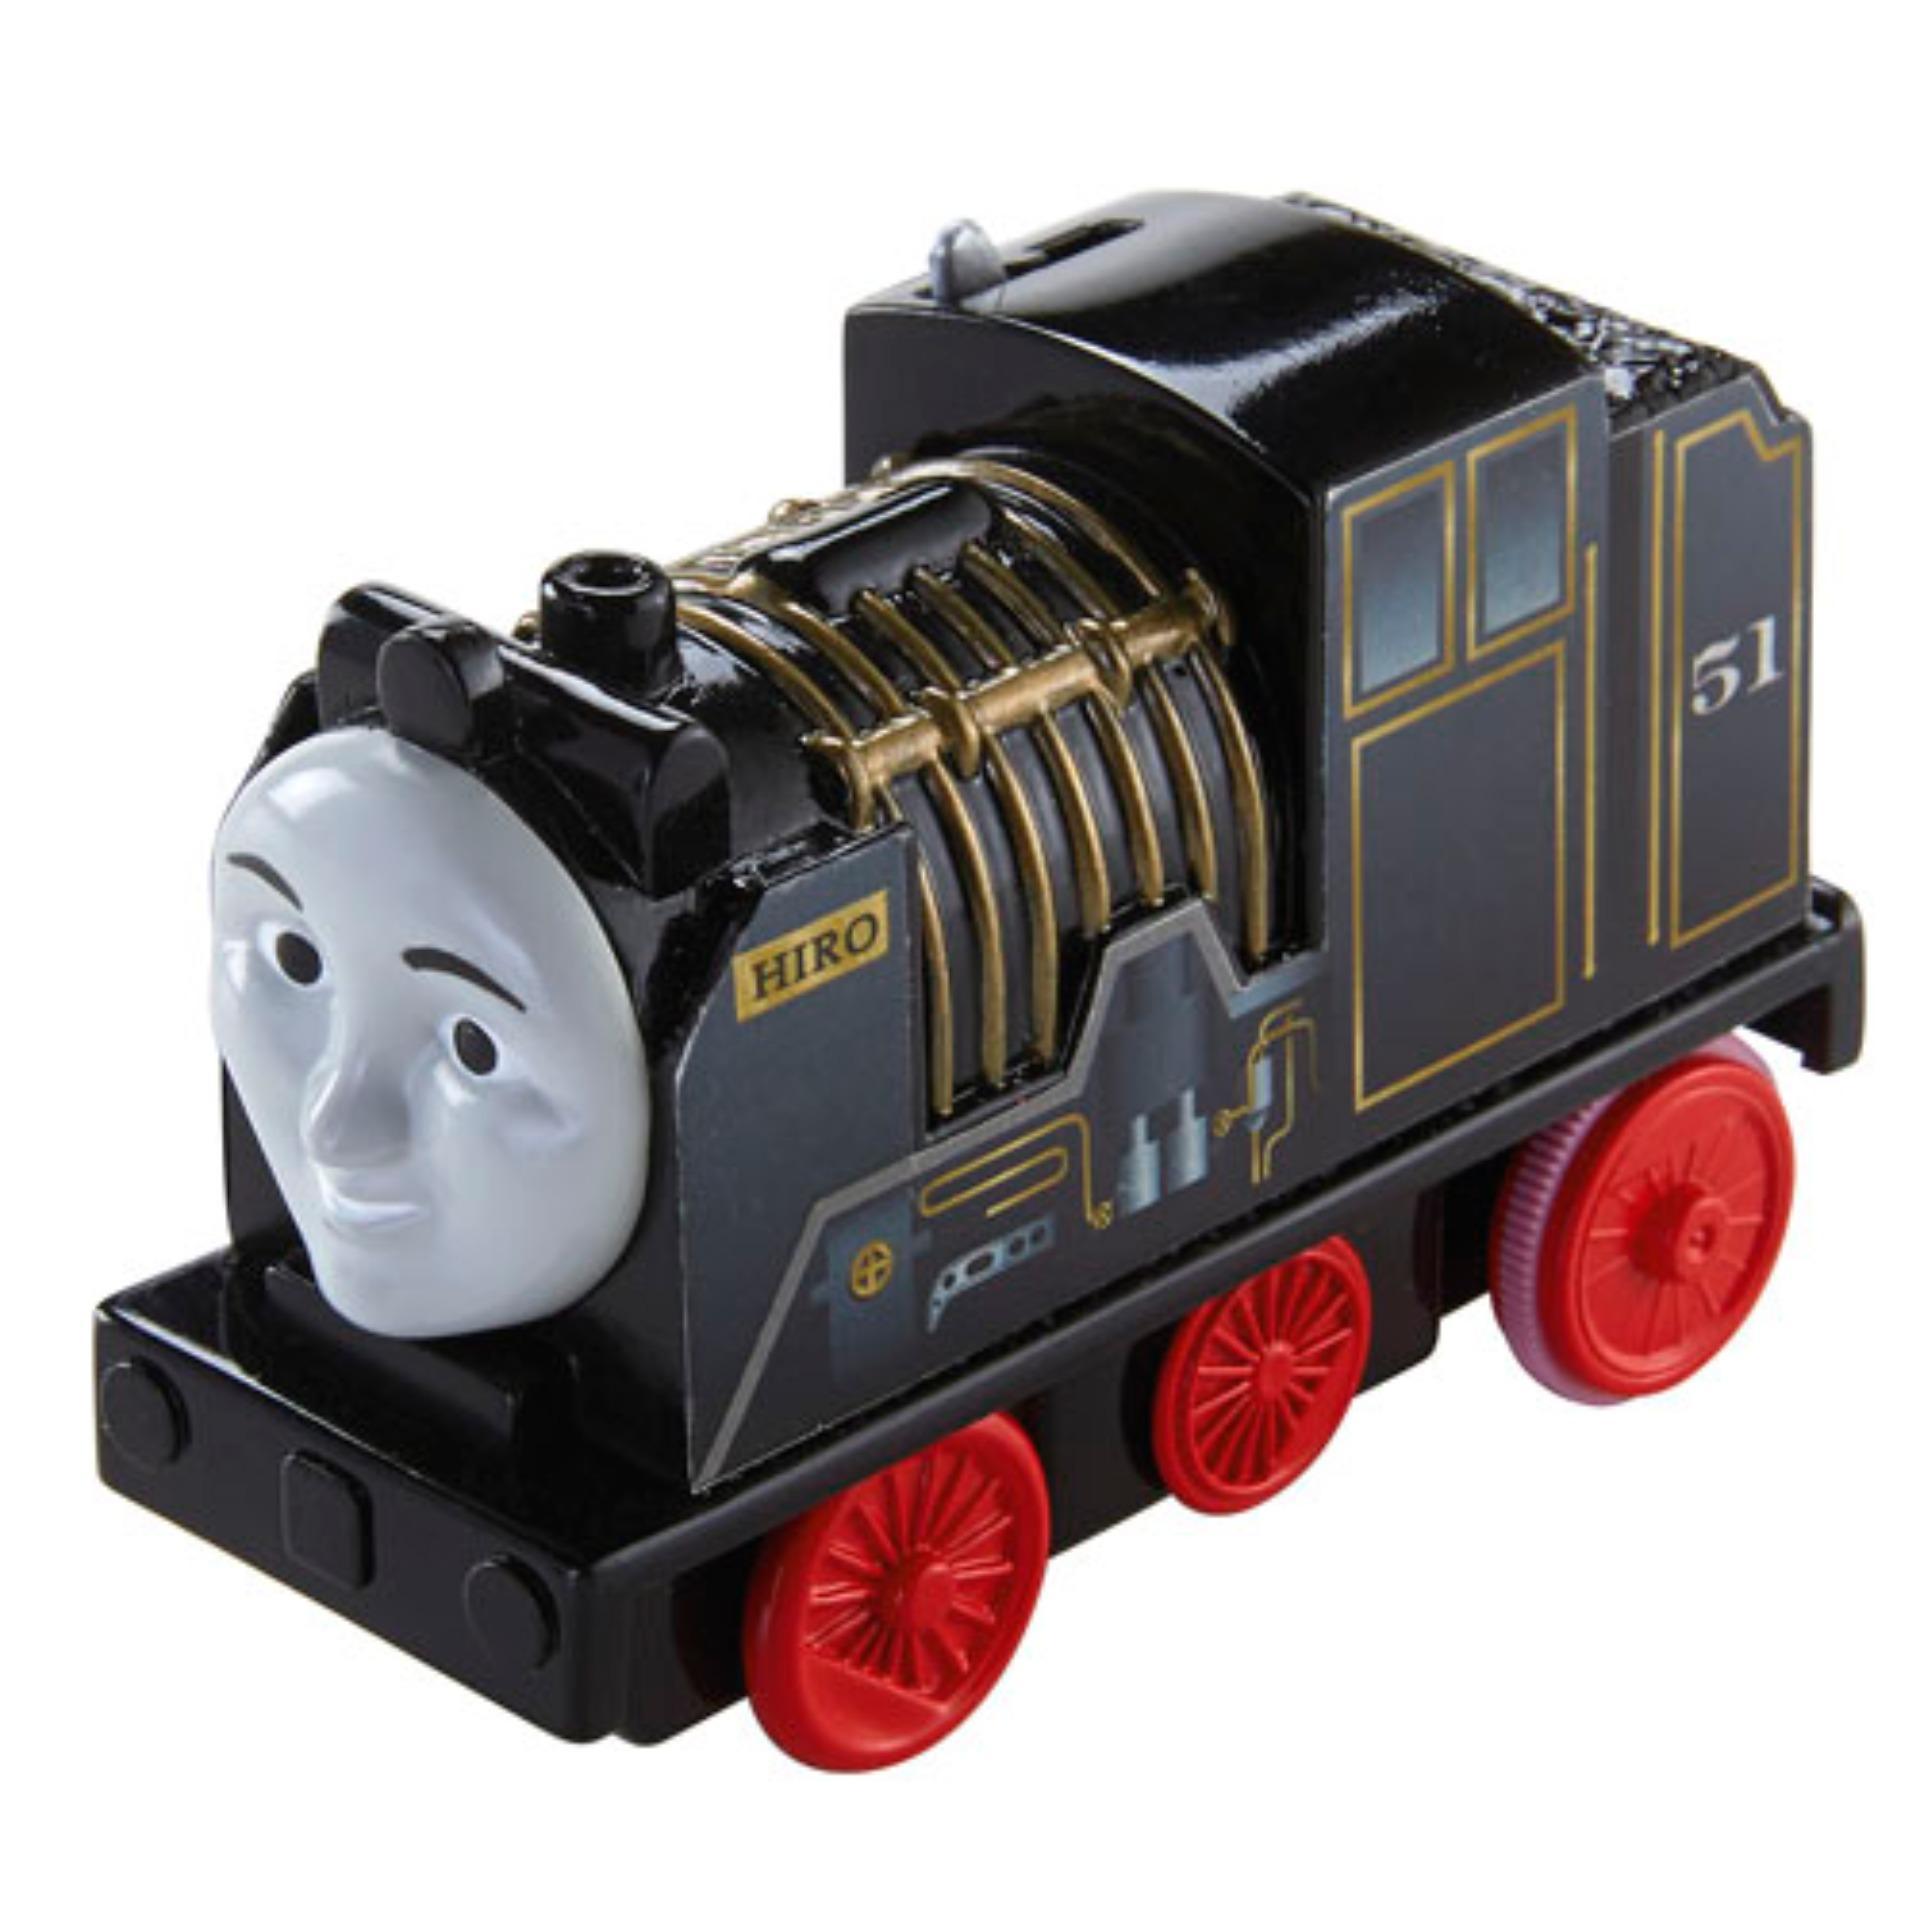 Thomas & Friends™ Motorized Railway Engine - Hiro